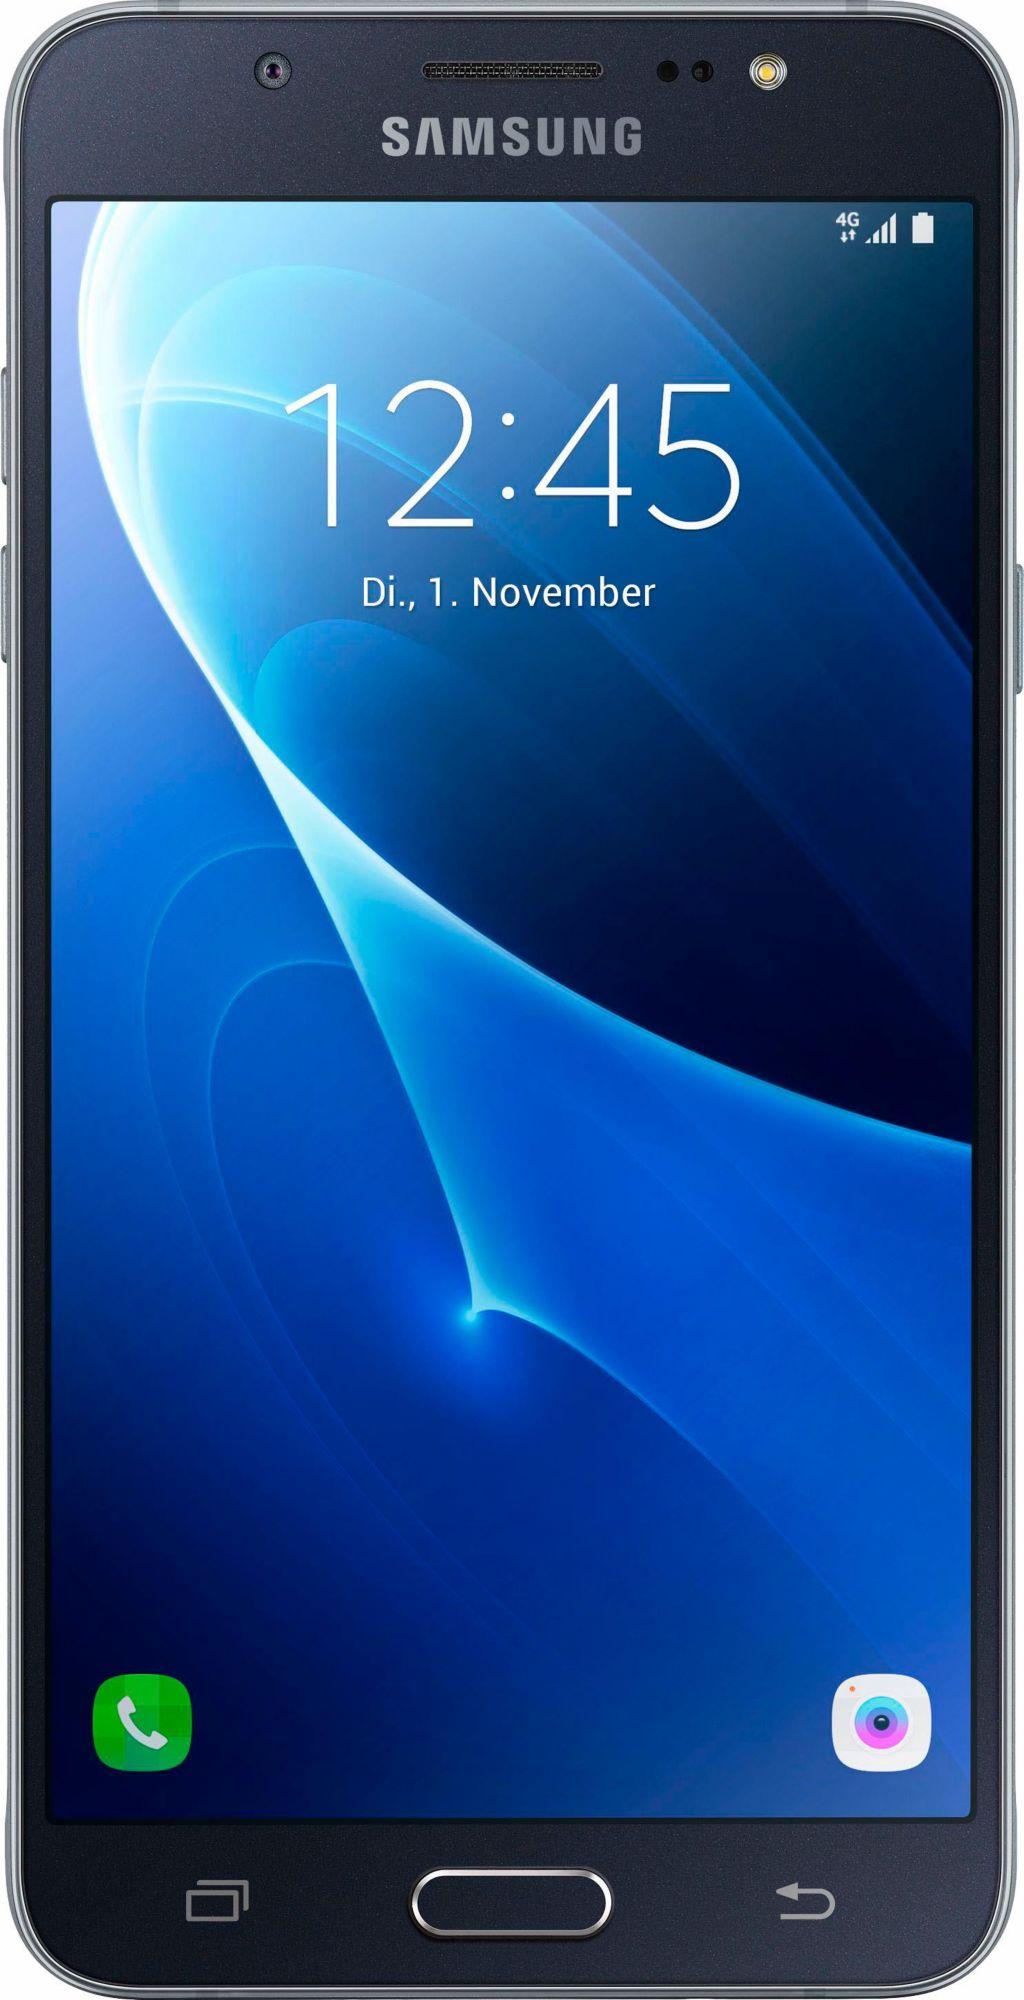 SAMSUNG .Samsung Galaxy J7 (2016) J710F black Android Smartphone